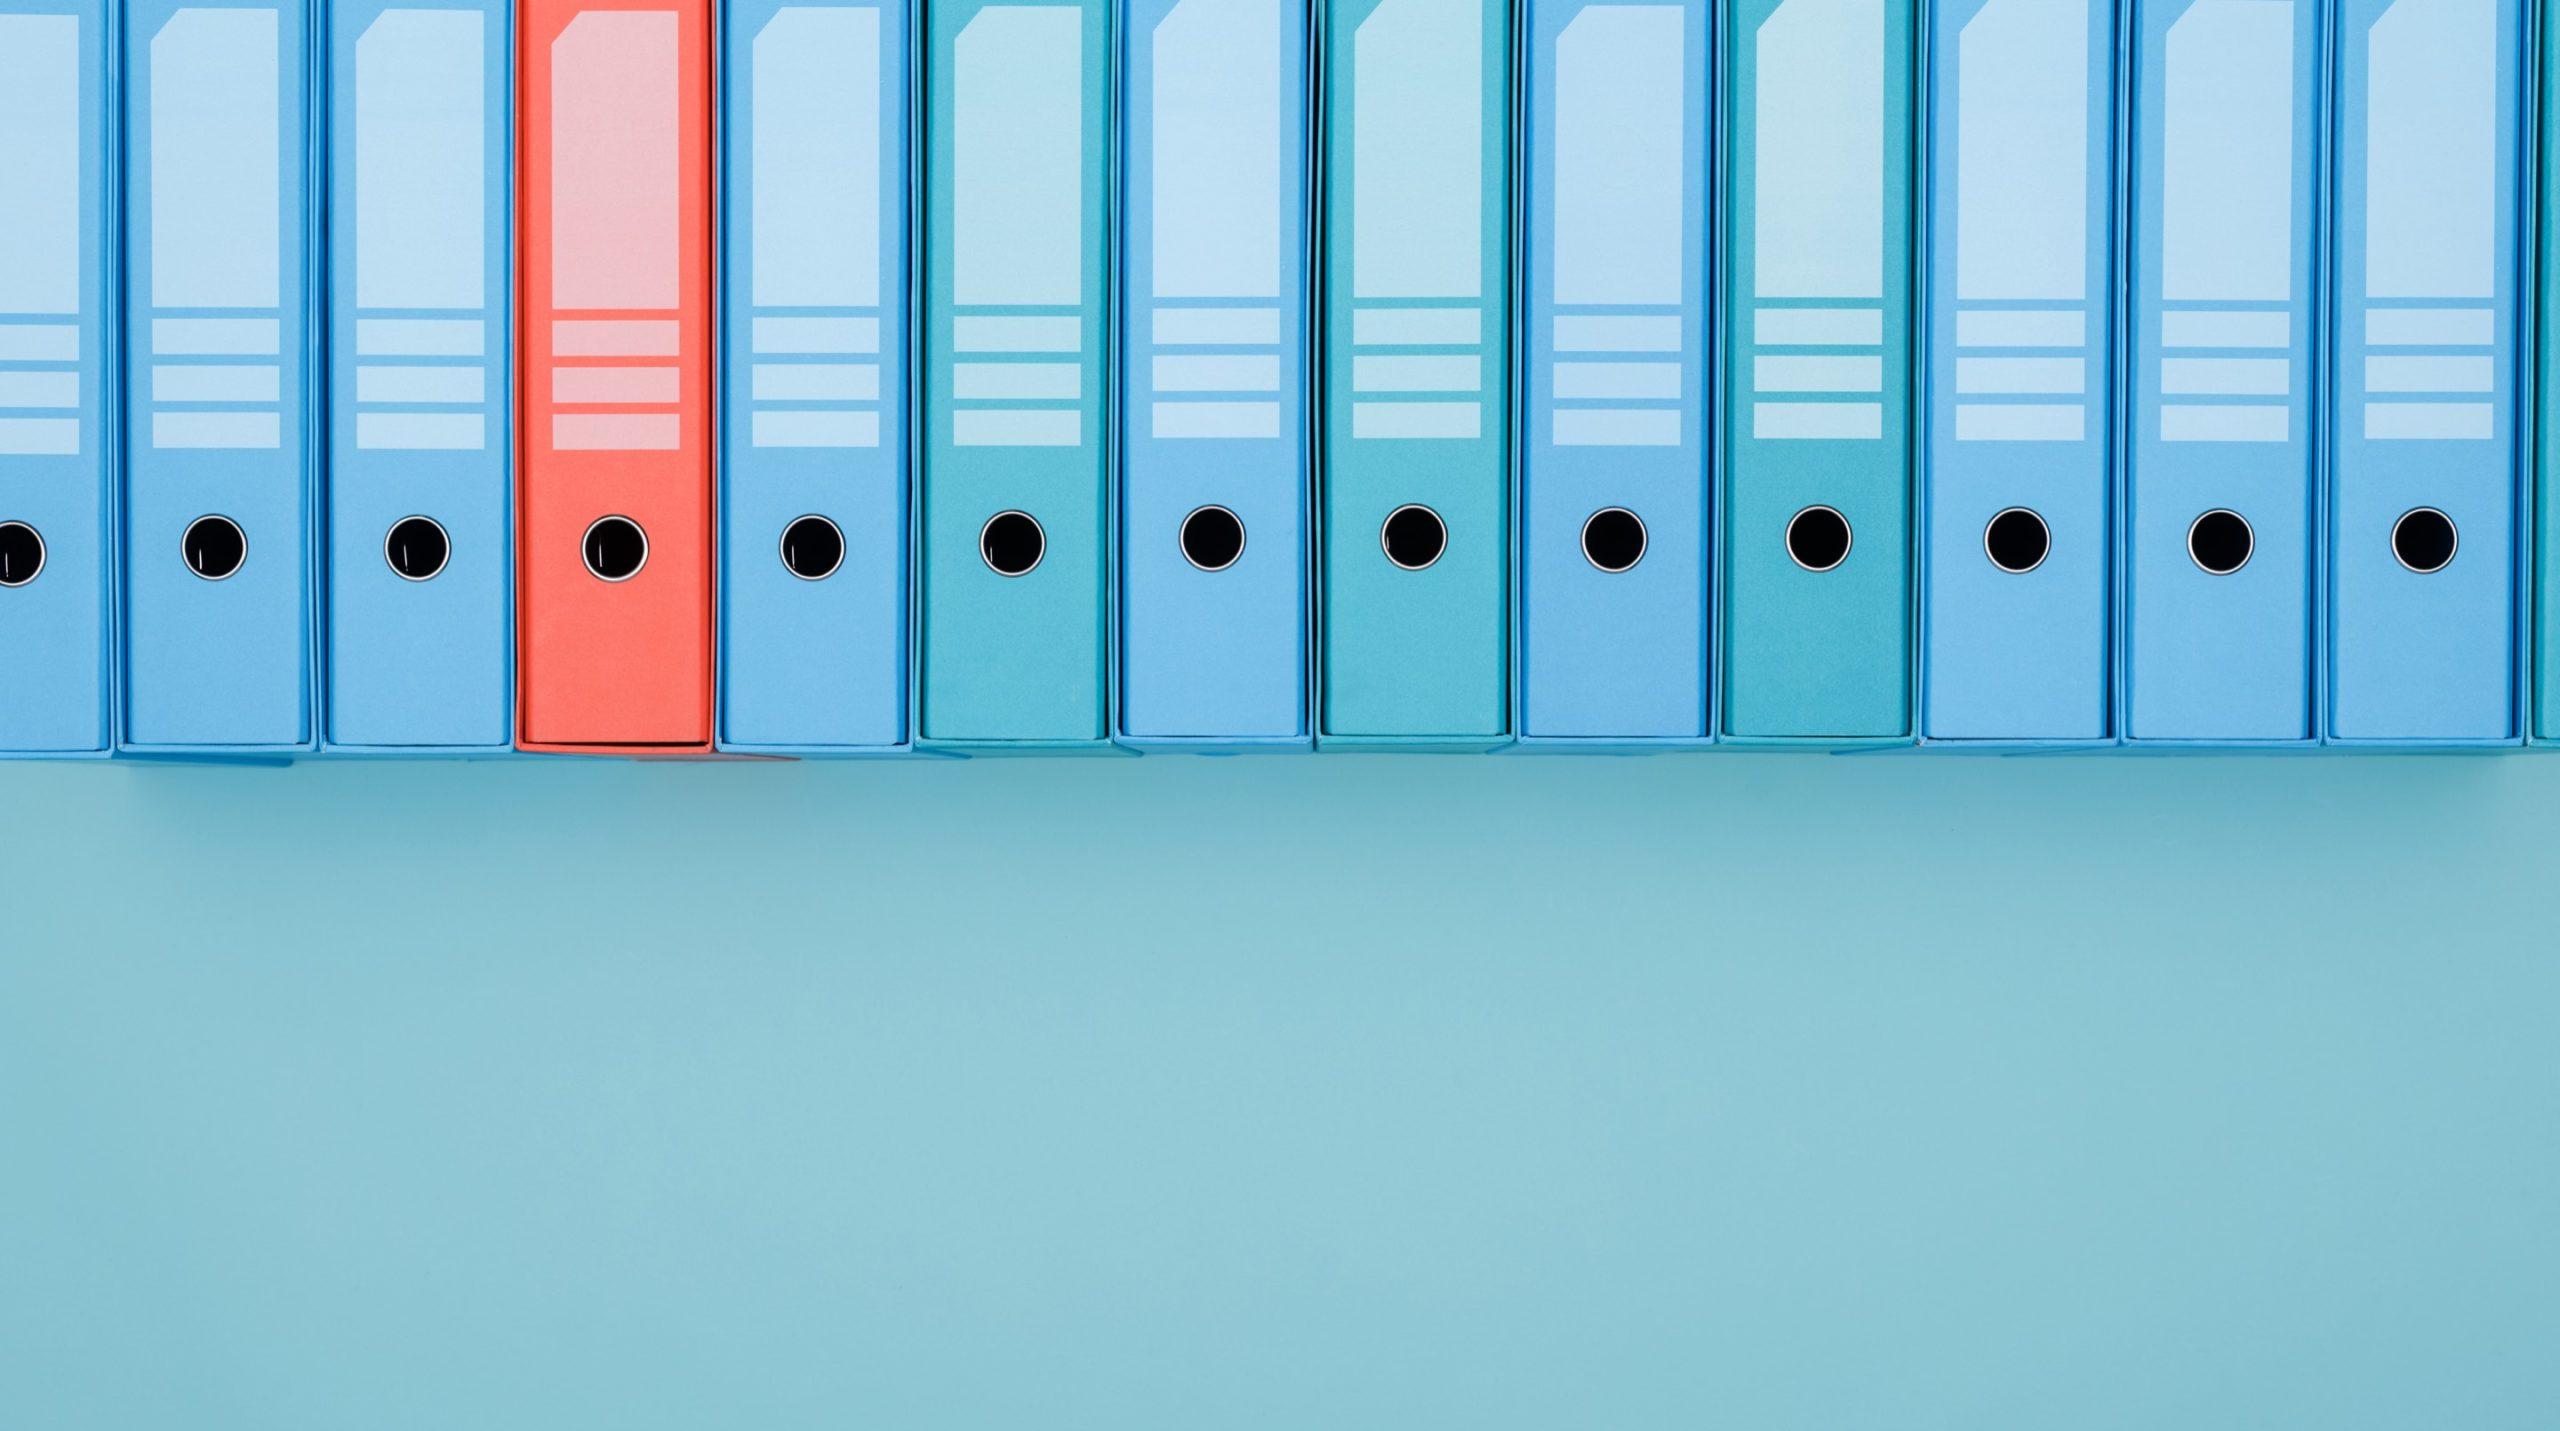 blog-banner-File-organization-for-Data-Lake